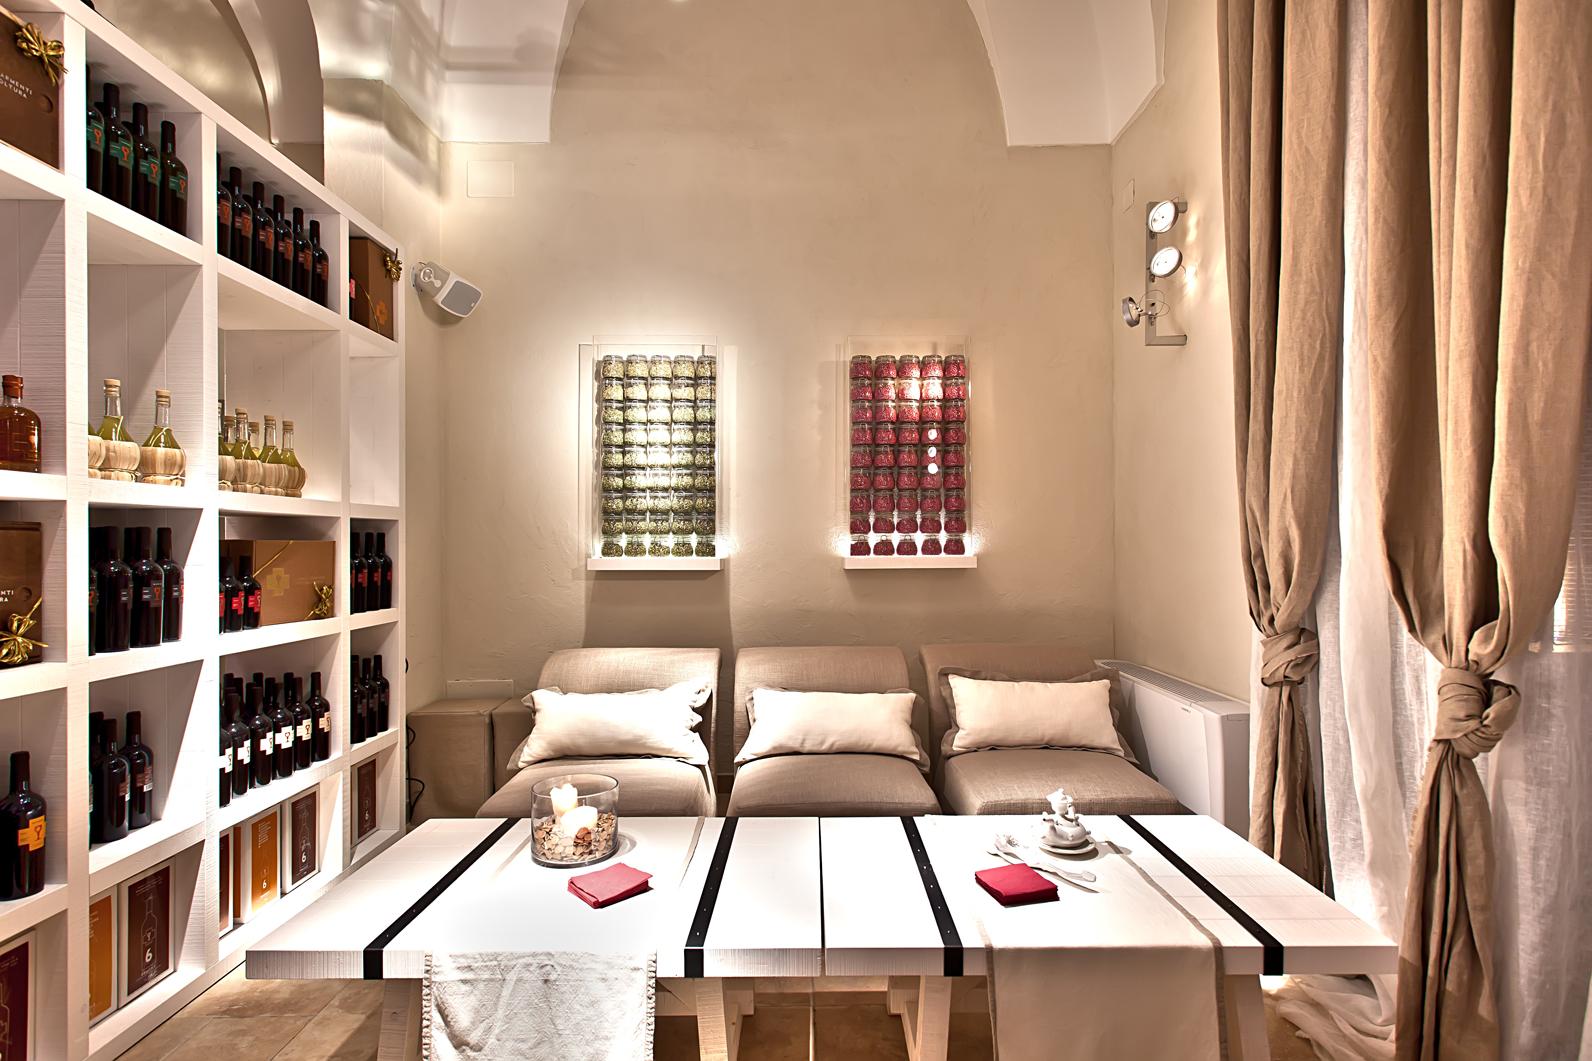 Interni design looteck lab studio for Interni design